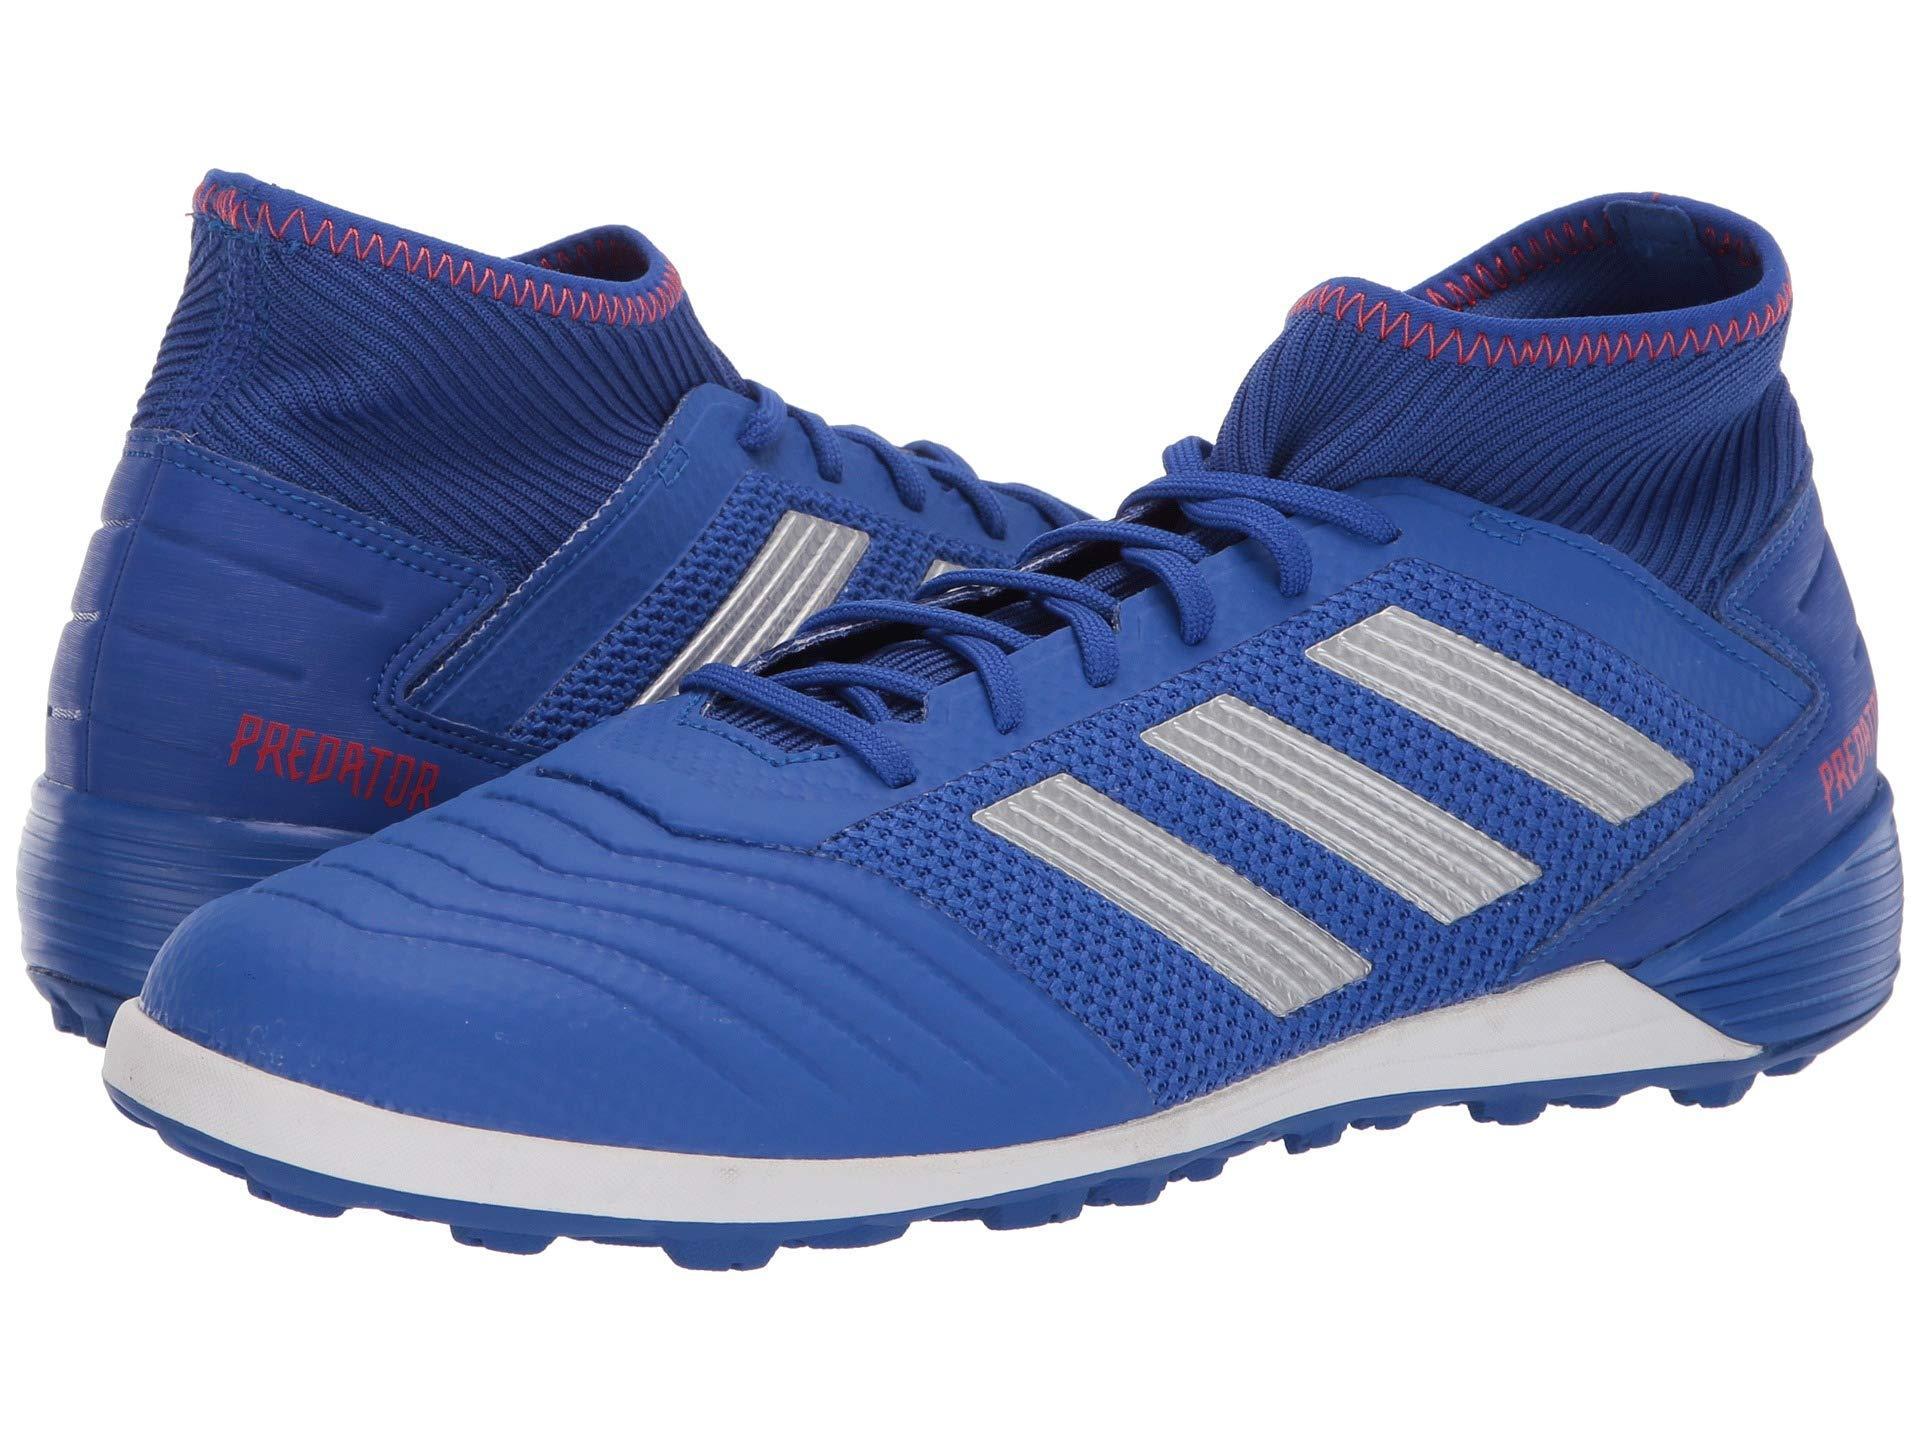 a2a5d88fbc6 adidas. Blue Predator 19.3 Tf (core Black core Black active Red) Men s  Soccer Shoes